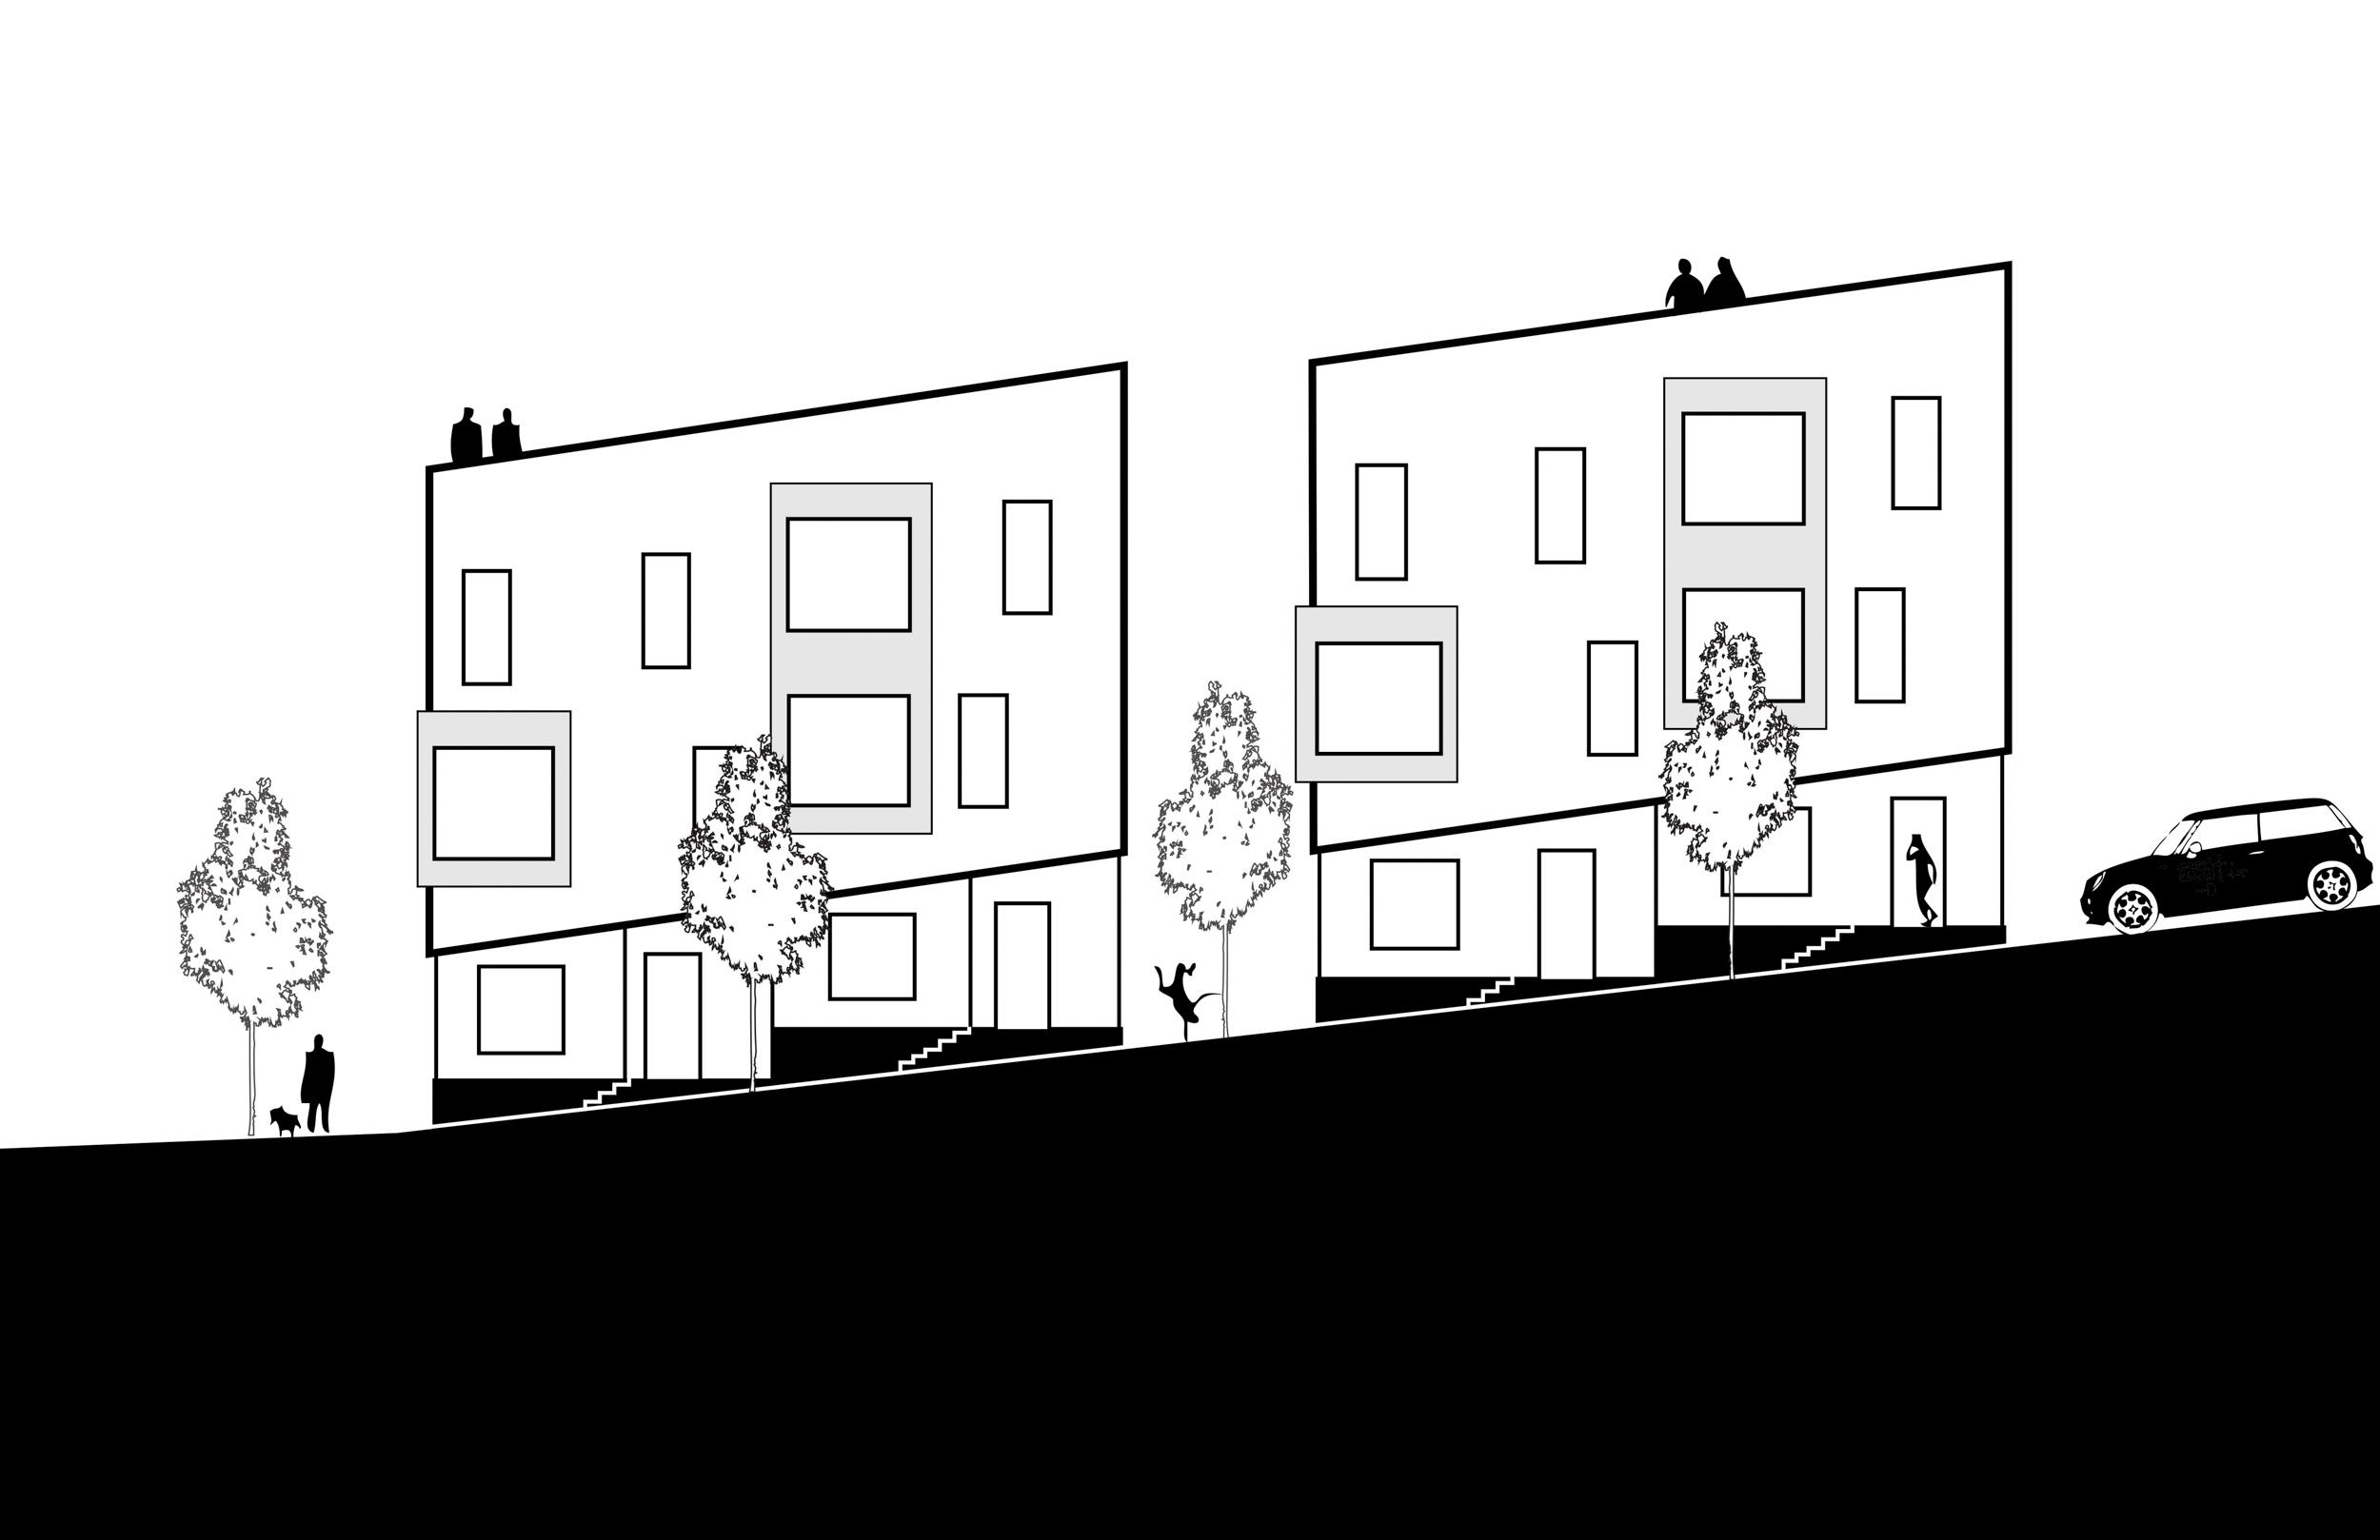 2302 G STREET - Diagram 7.jpg